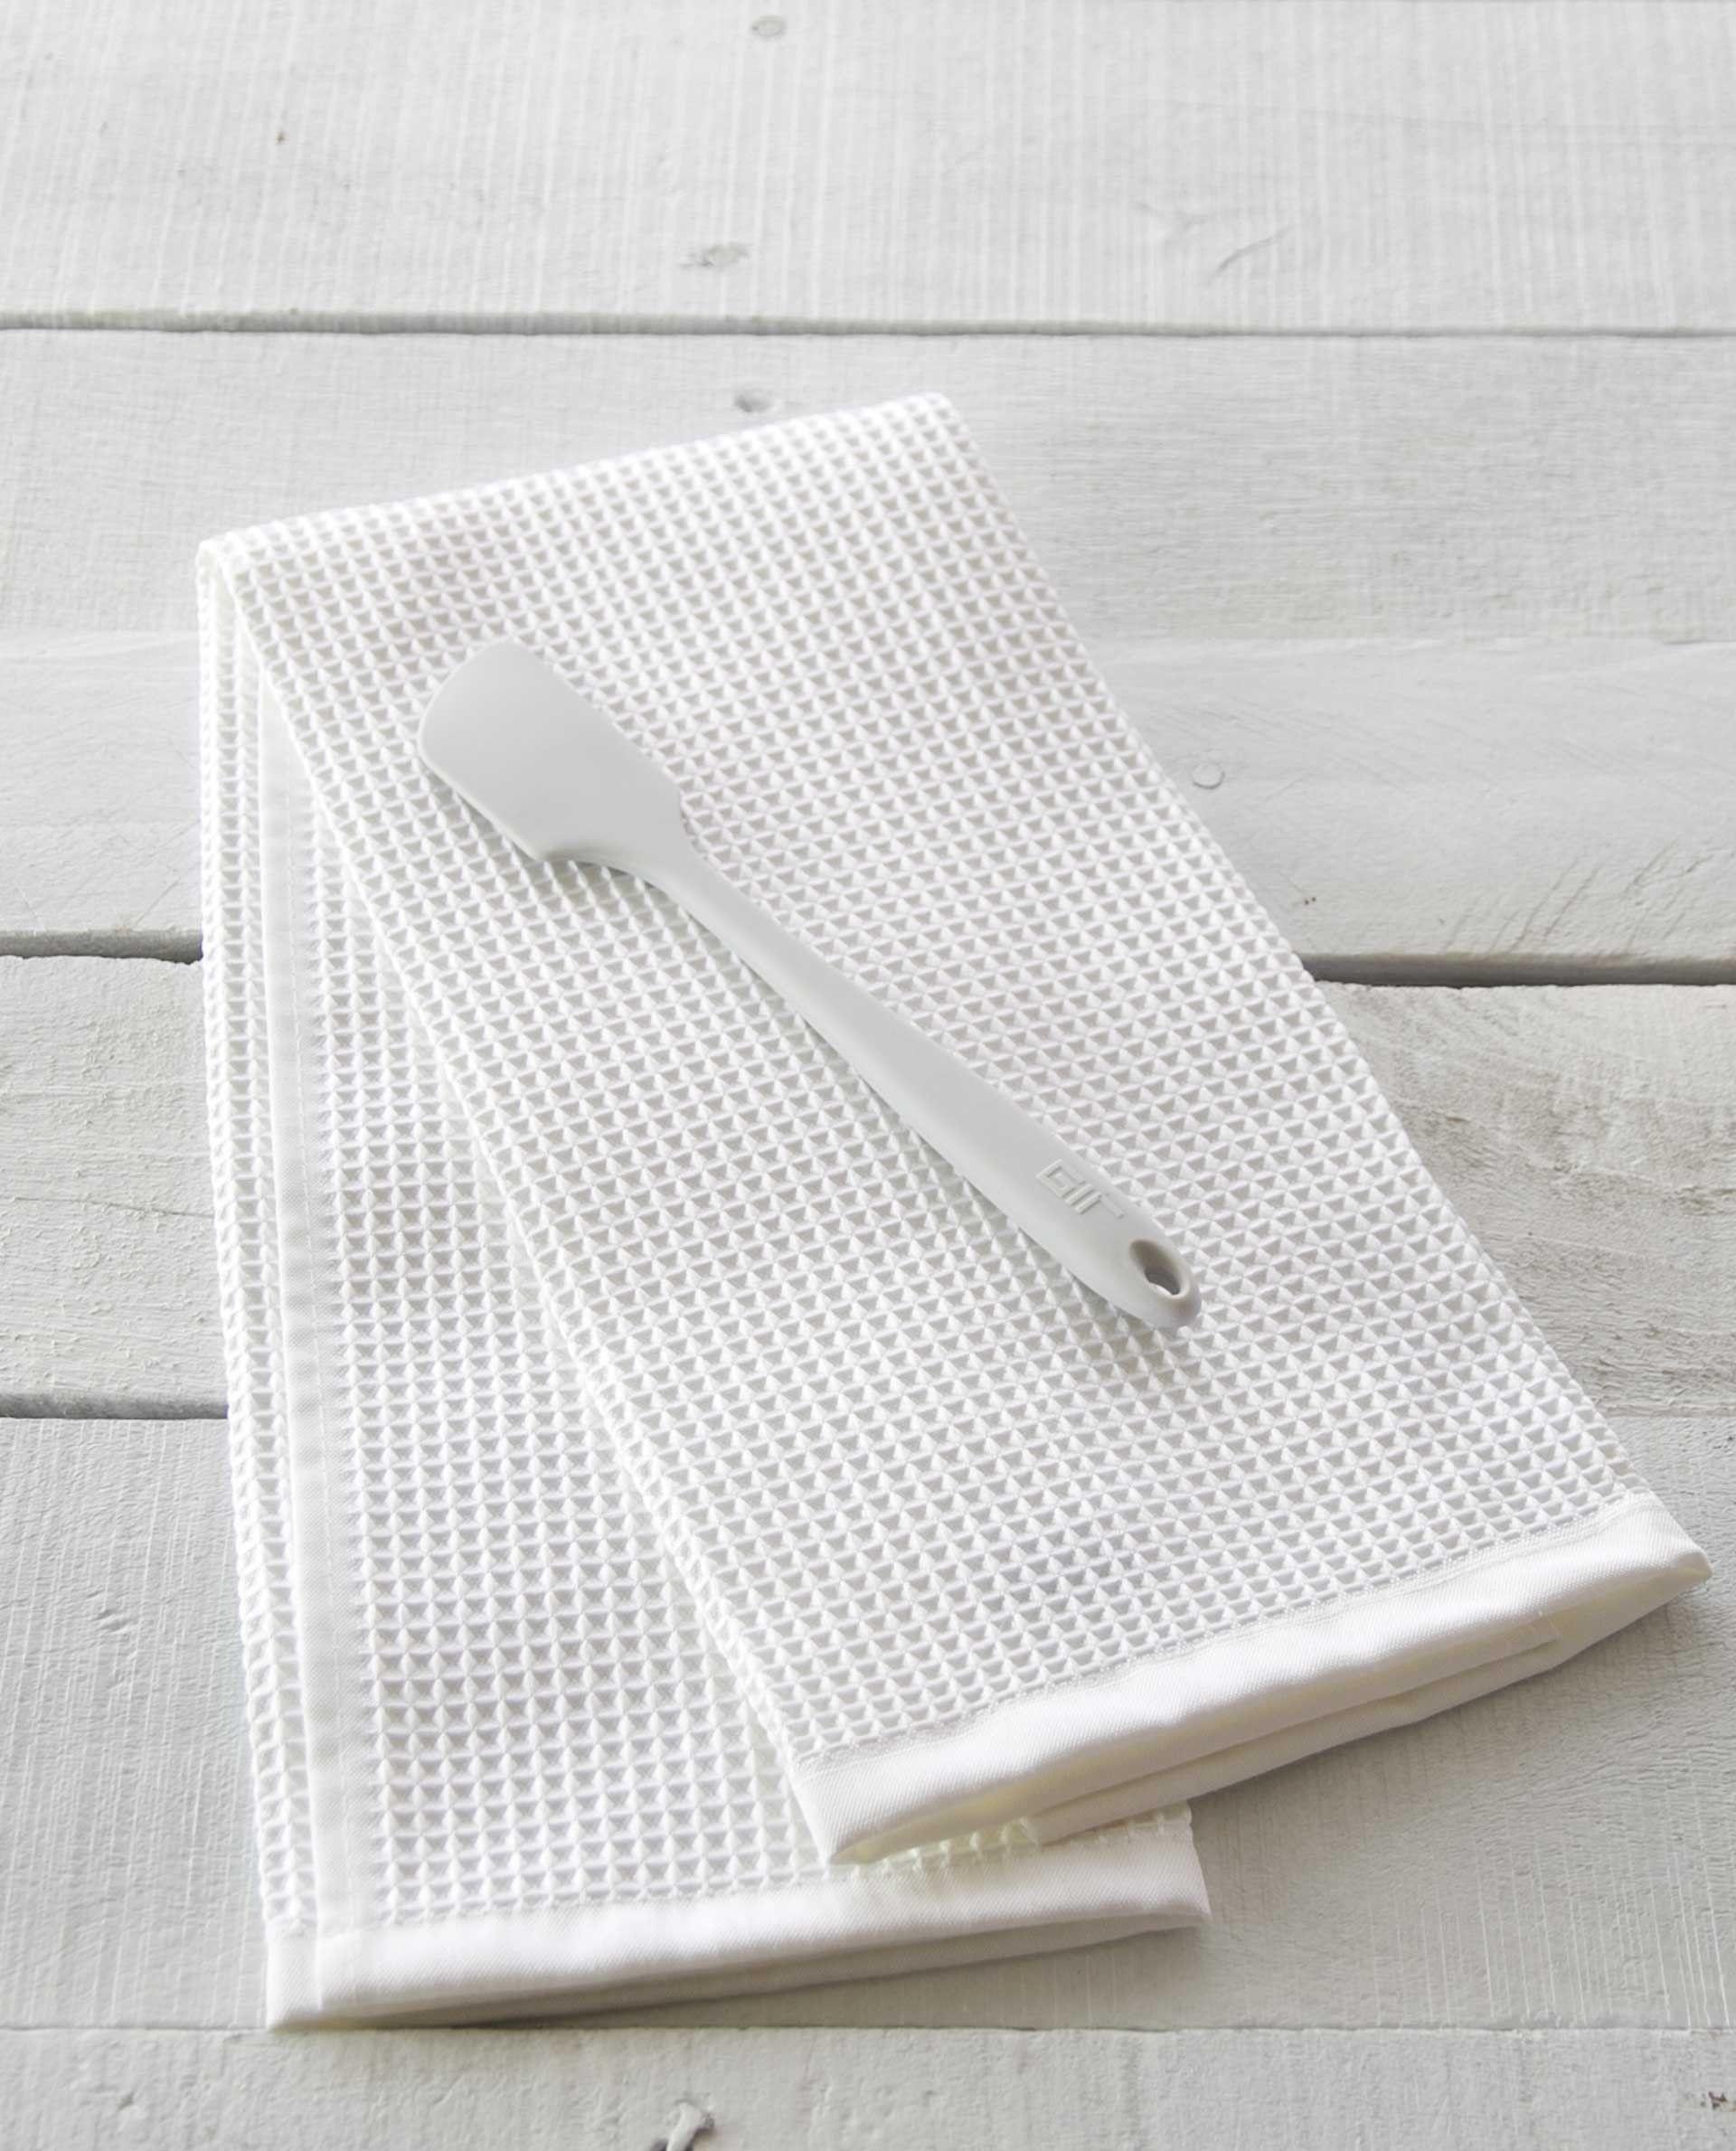 Gir Mini Spatula Studio White Now Available On Buymeonce